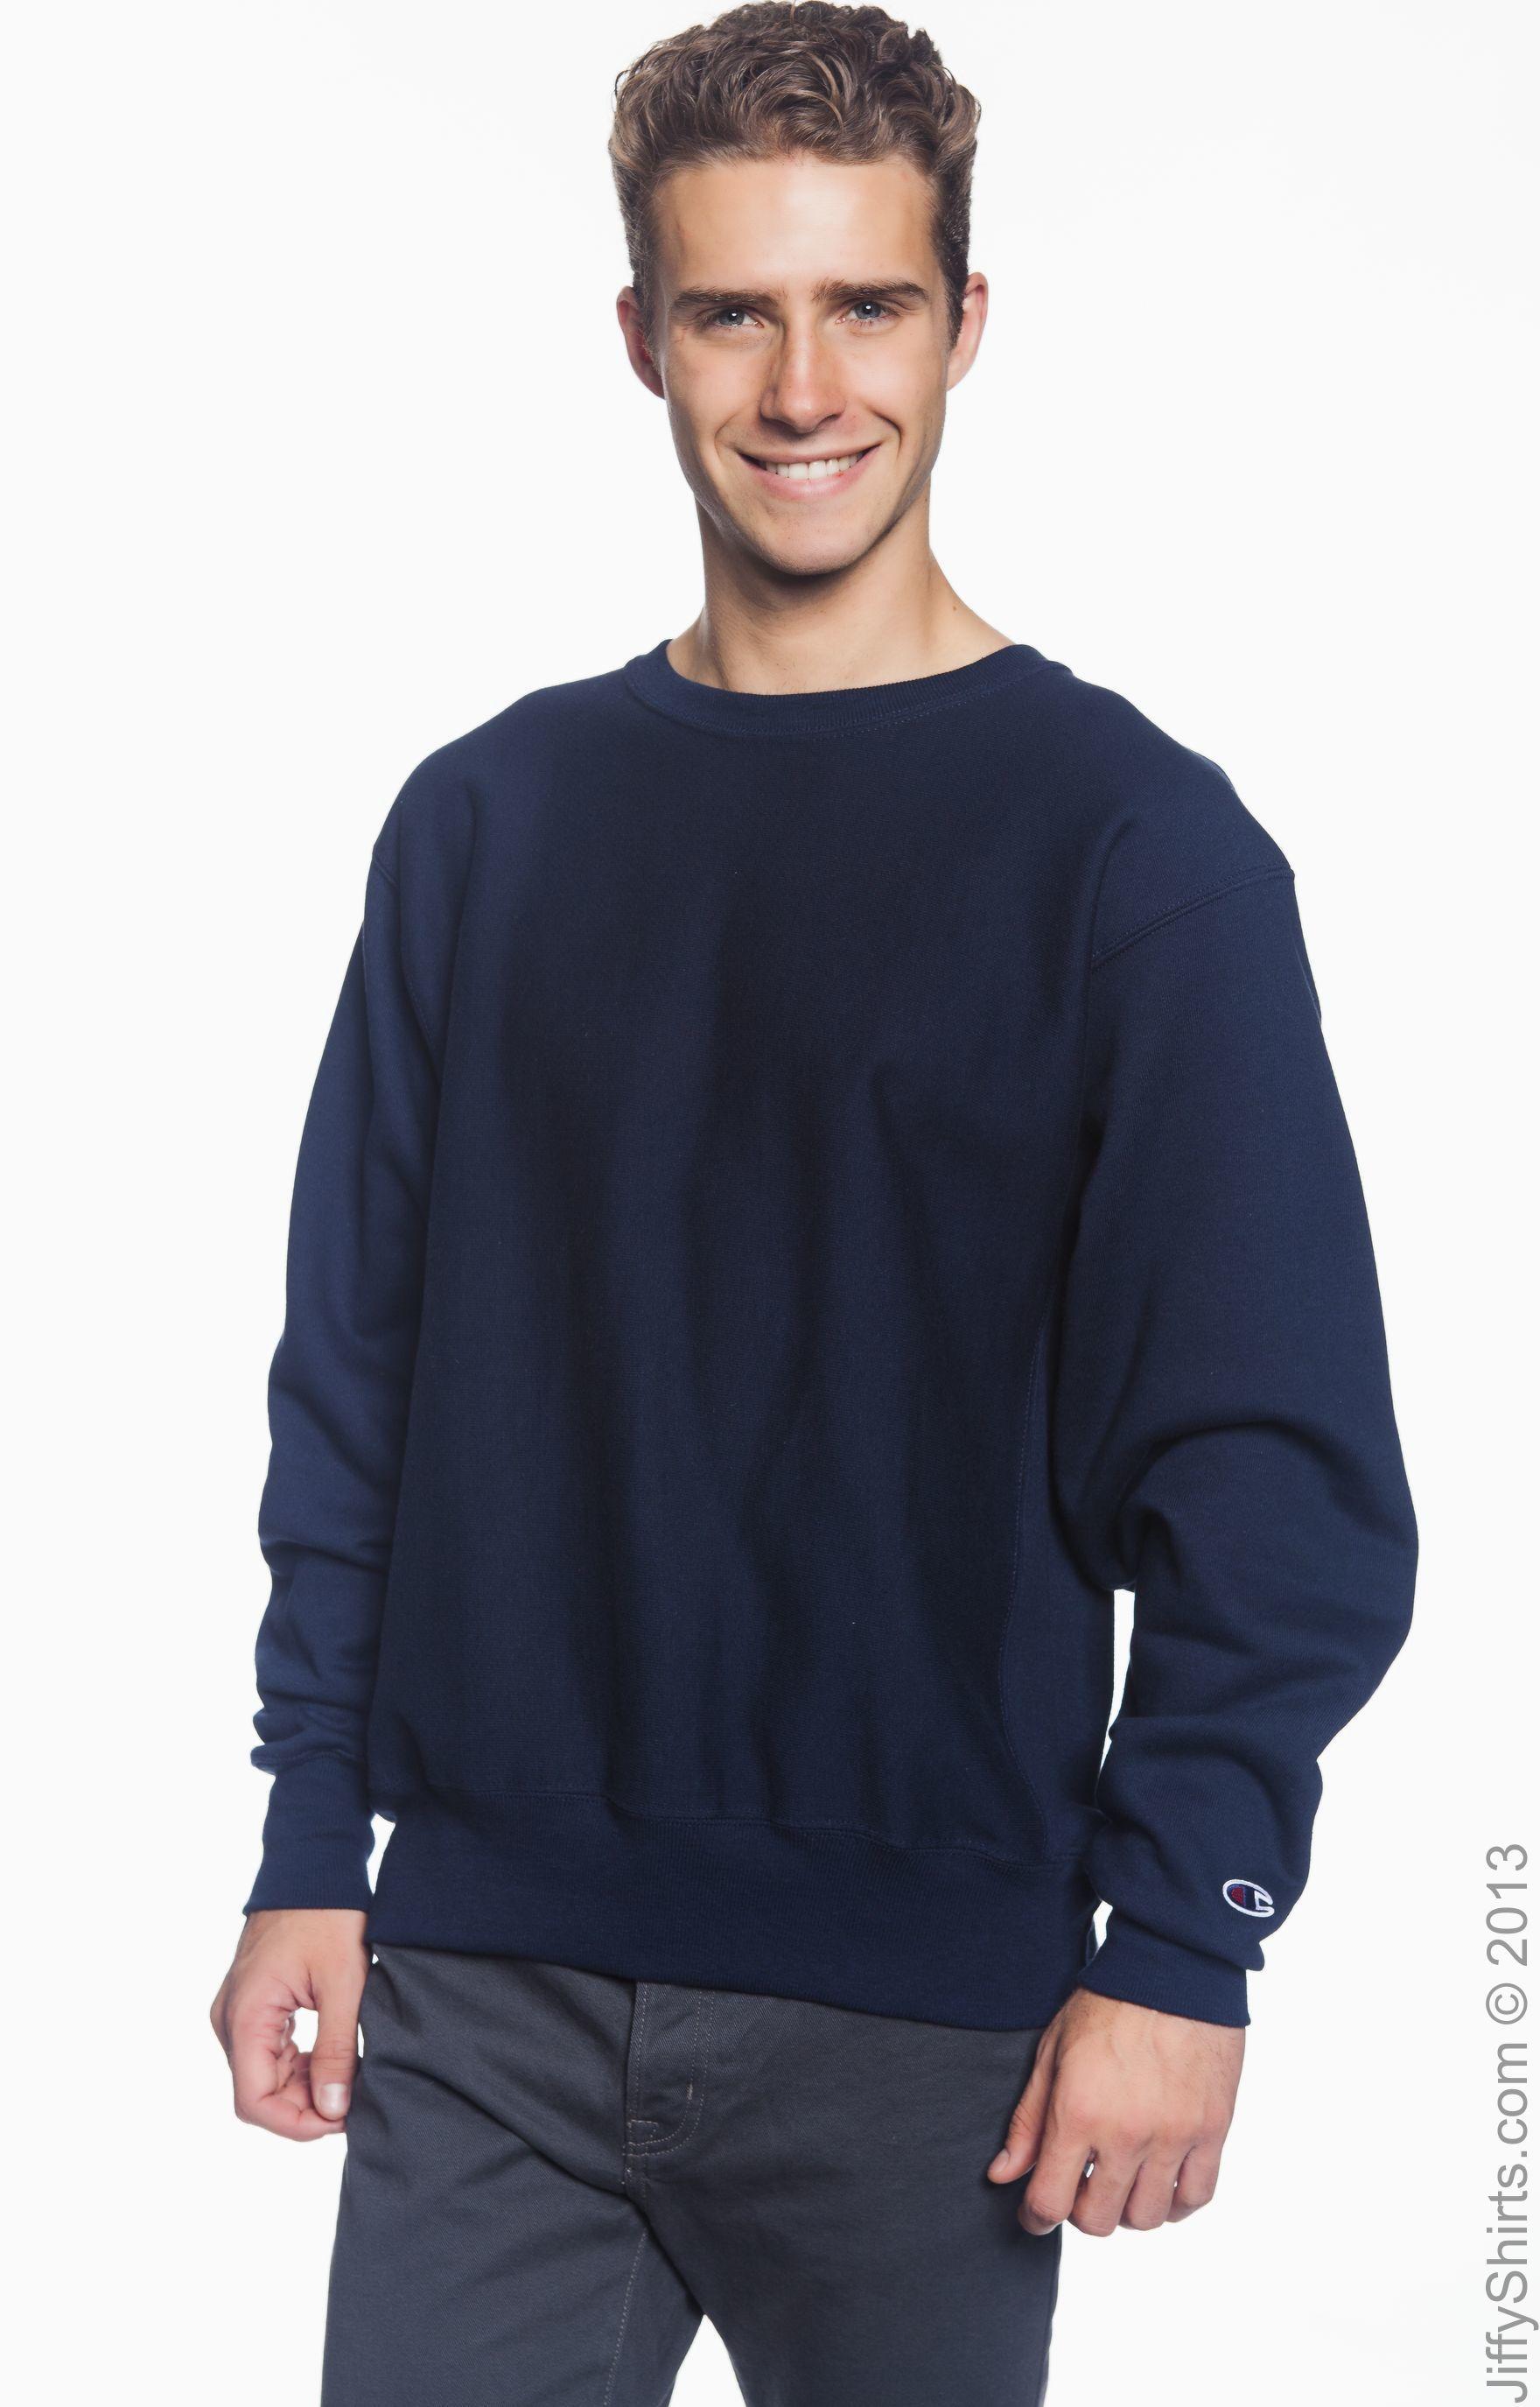 Champion Adult Reverse Weave Crew Neck Sweatshirt Crew S-XL 2XL 3XL 12oz S149